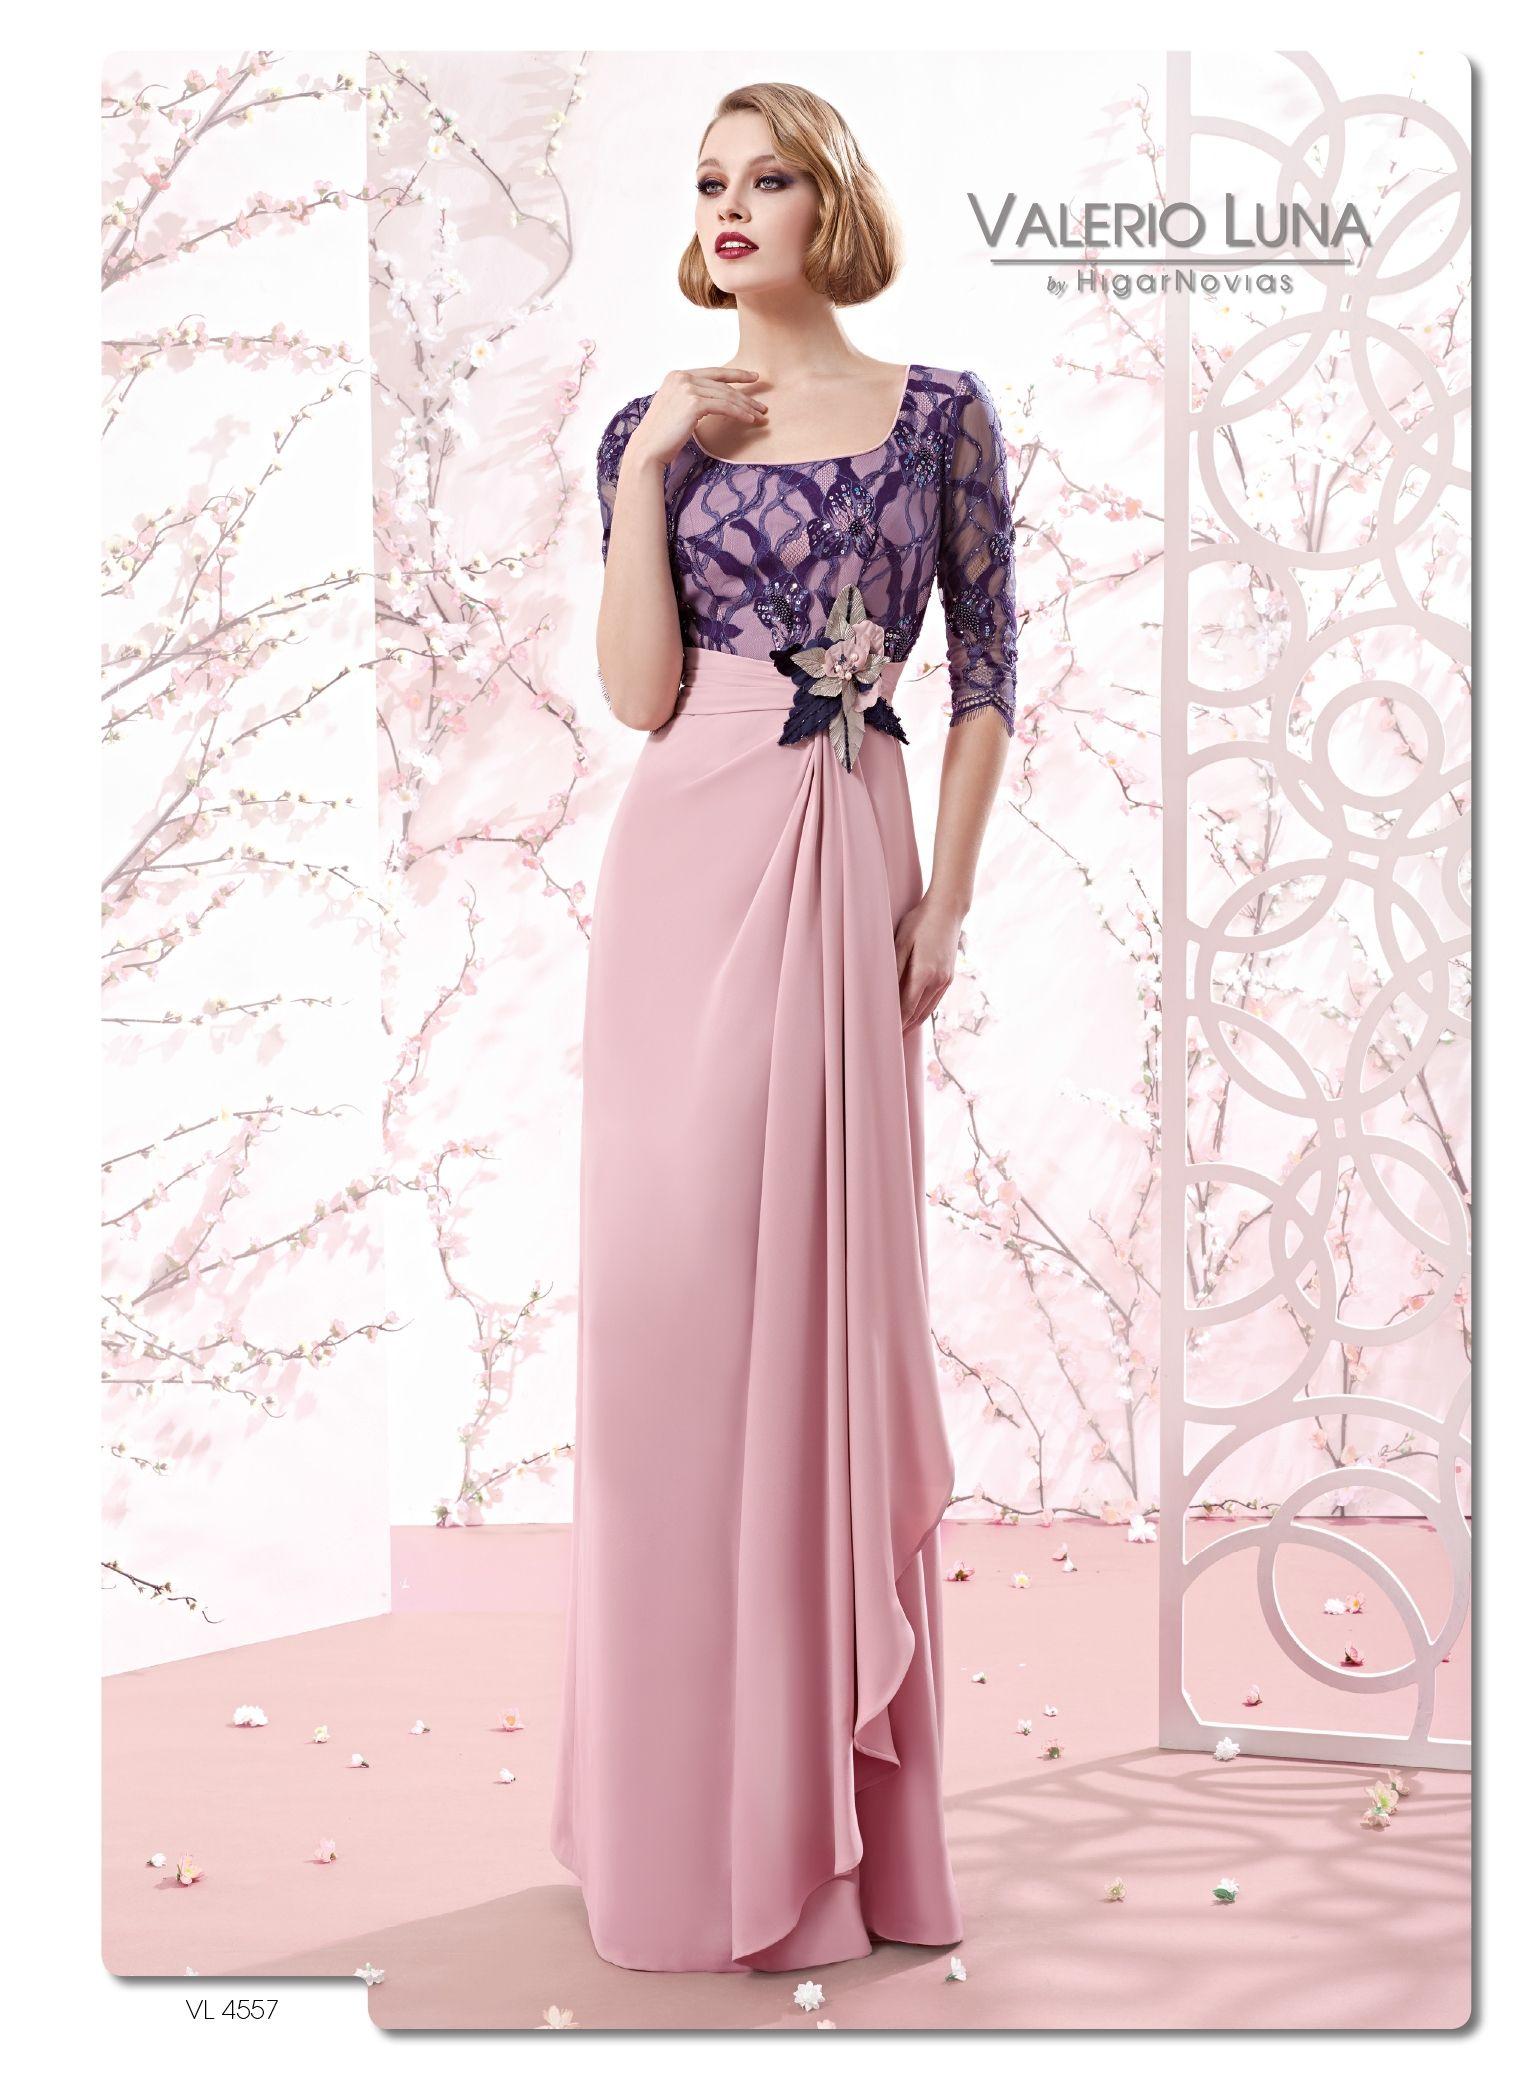 VL4557 - Vestido de Fiesta - Valerio Luna   Moda   Pinterest ...